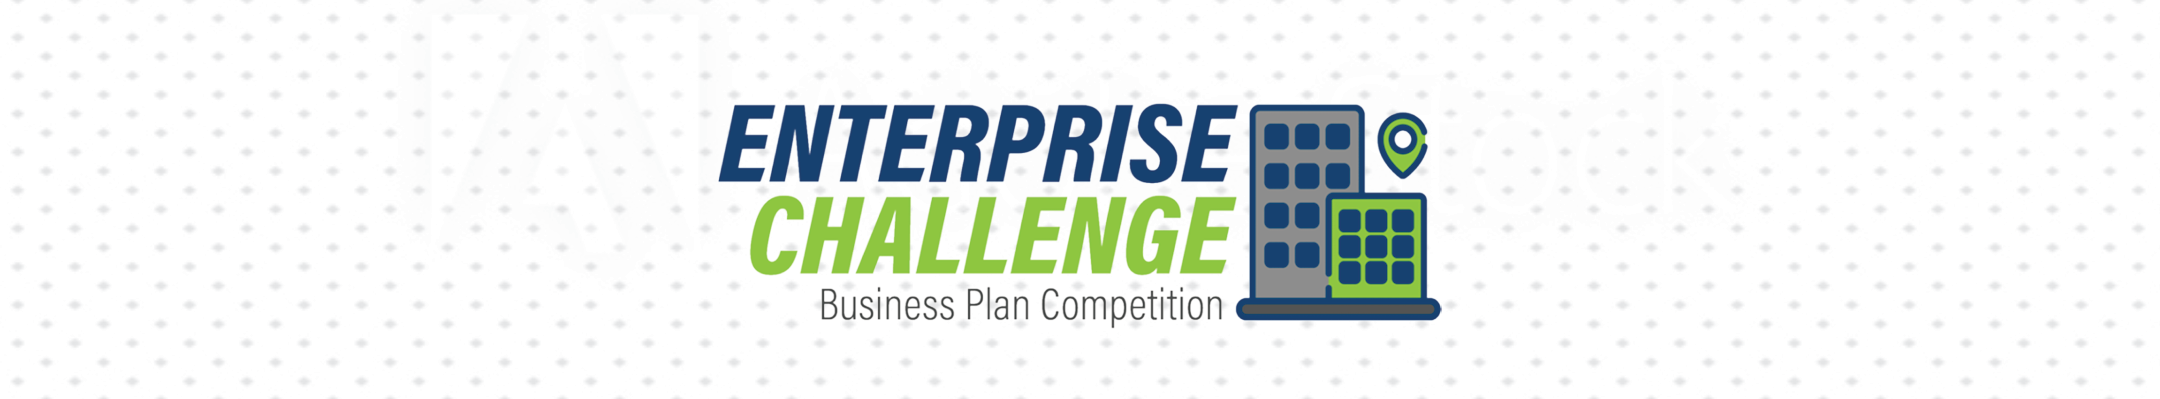 Enterprise-Challenge-YCDA-Website-Banner-2021-6 edit